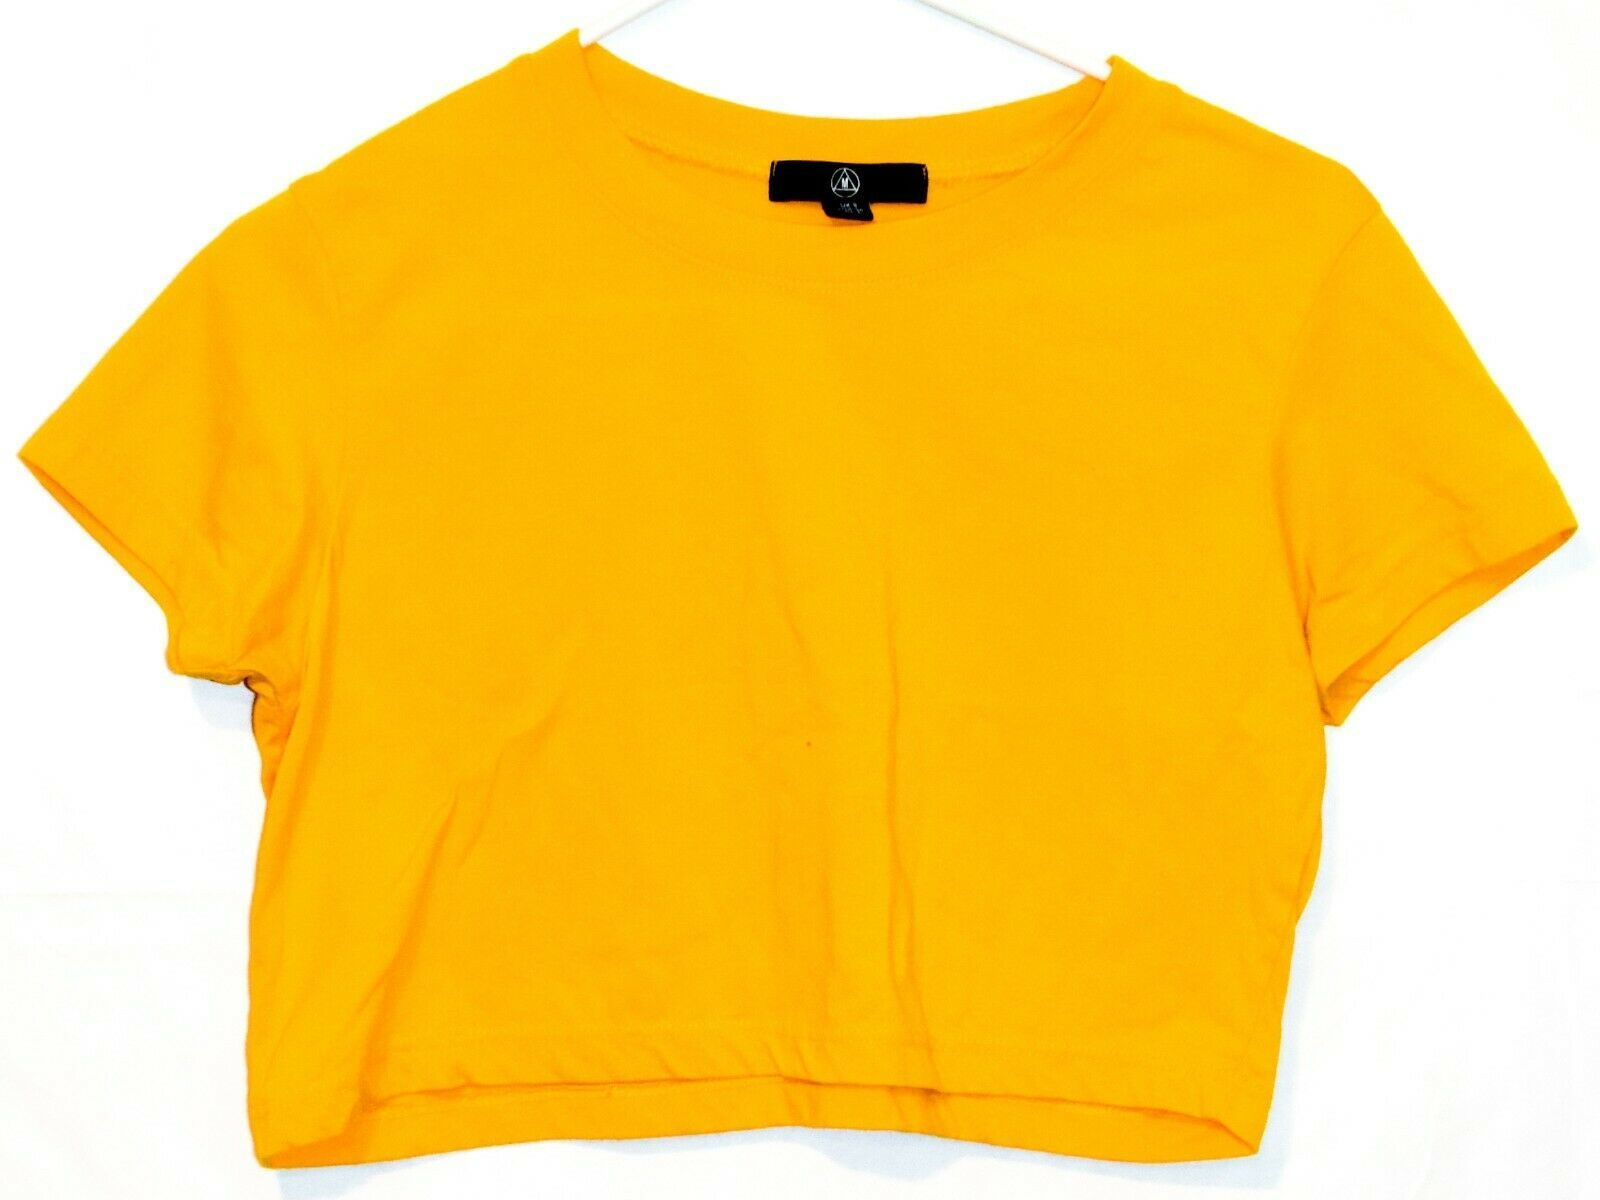 Missguided Women's Yellow Crop Top Short Sleeve T-Shirt Size 4